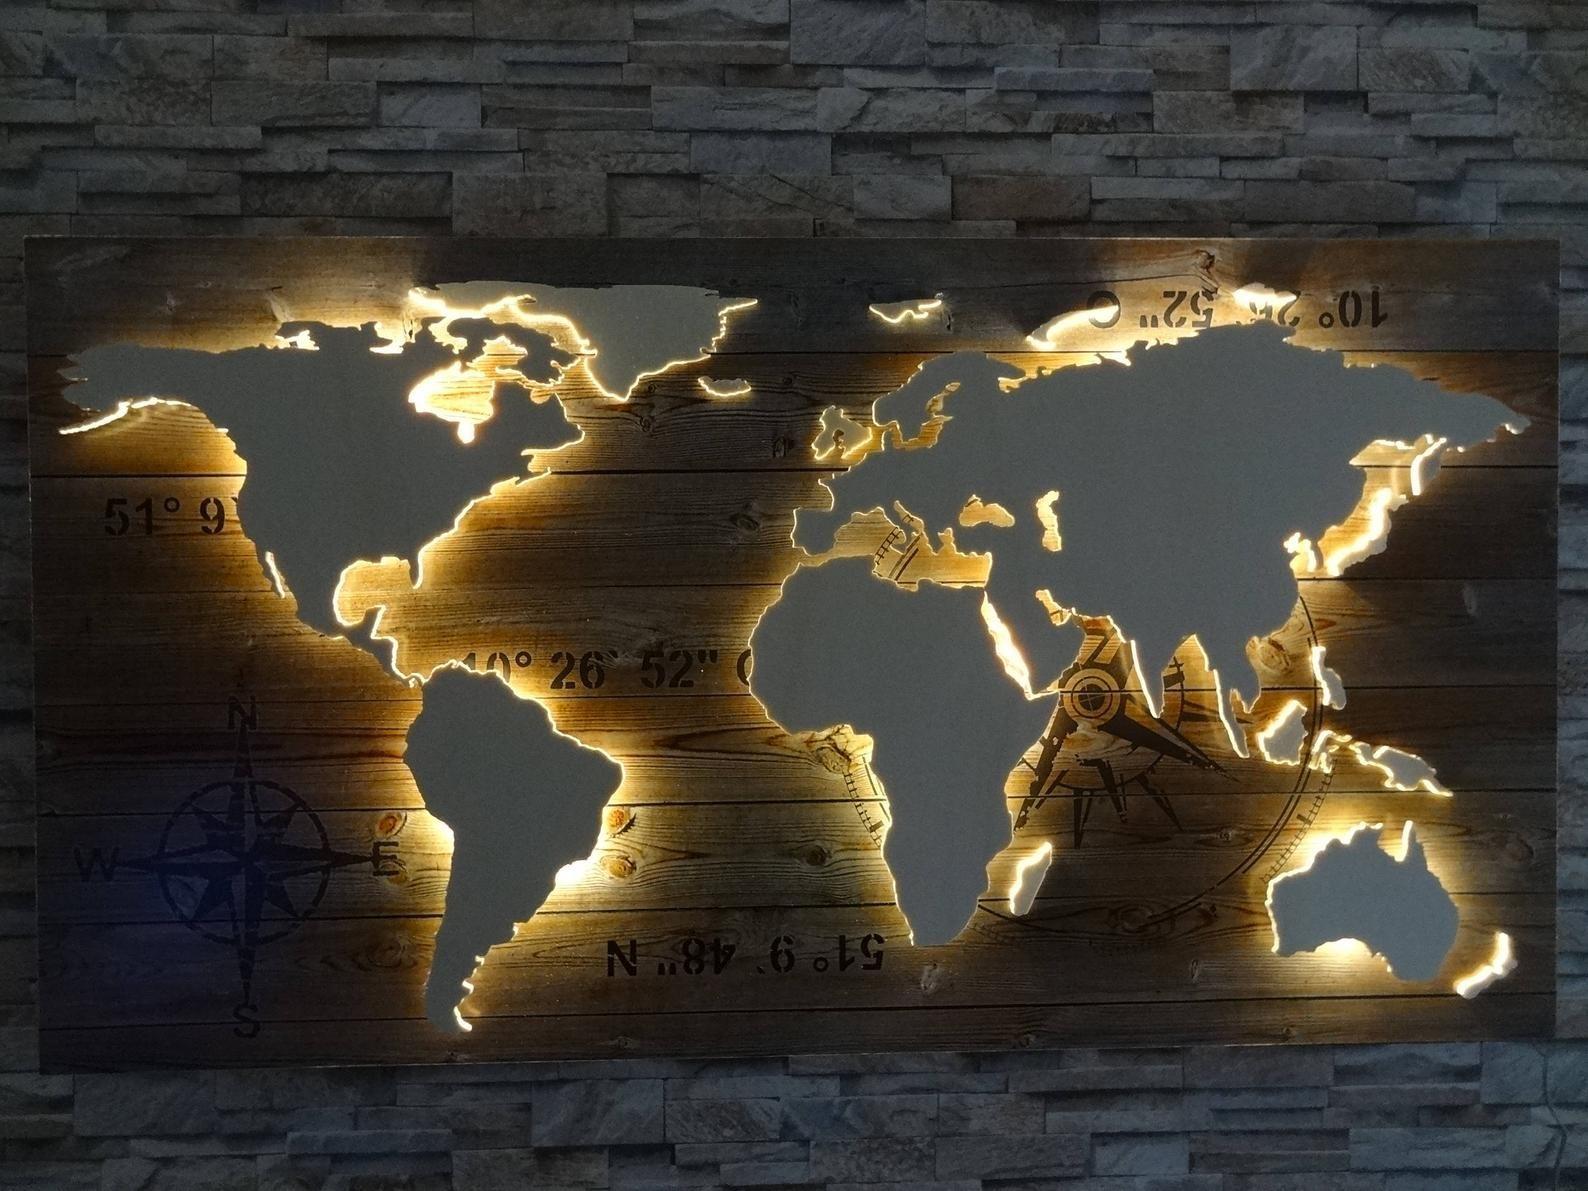 Weltkarte Aus Holz Led Beleuchtung 3d Effekt Wood World Map Map Wall Decor Led Lights